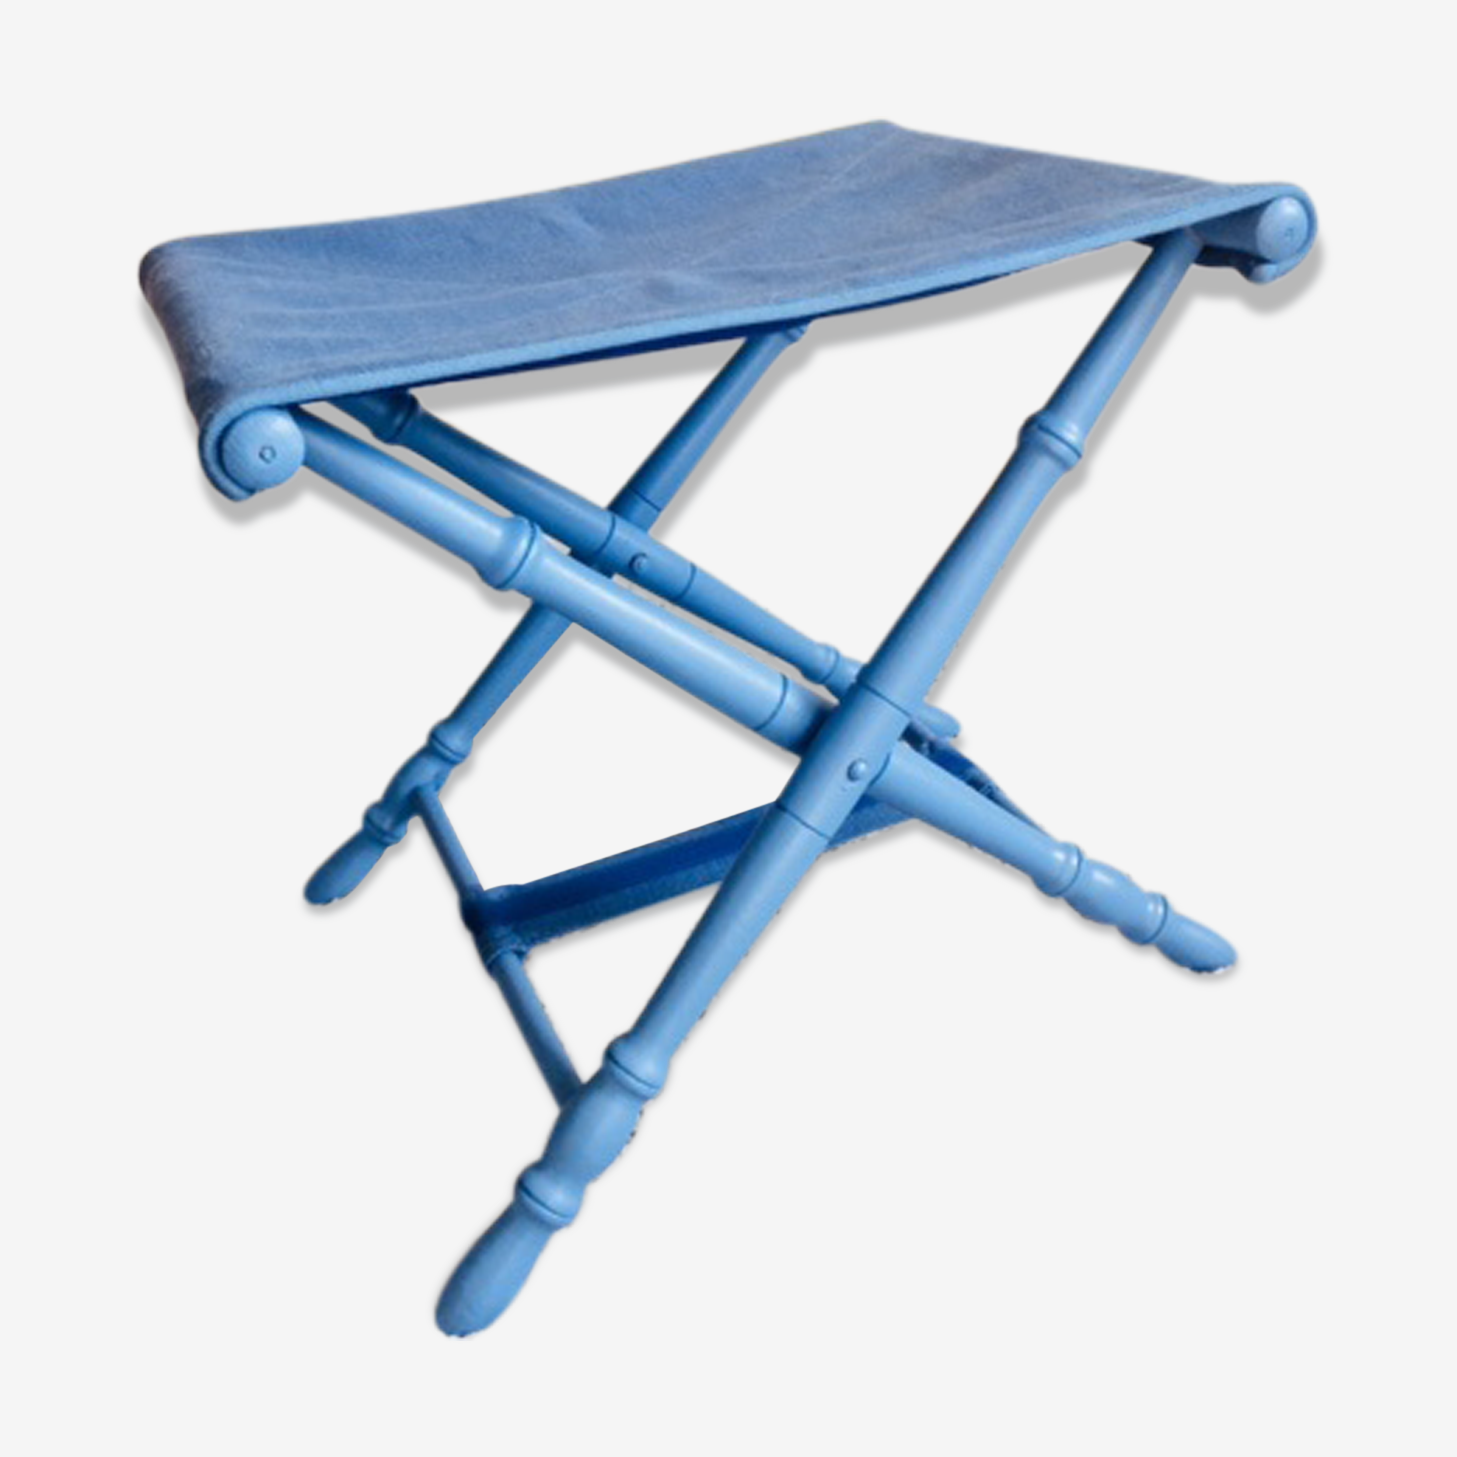 Monochrome folding old stool